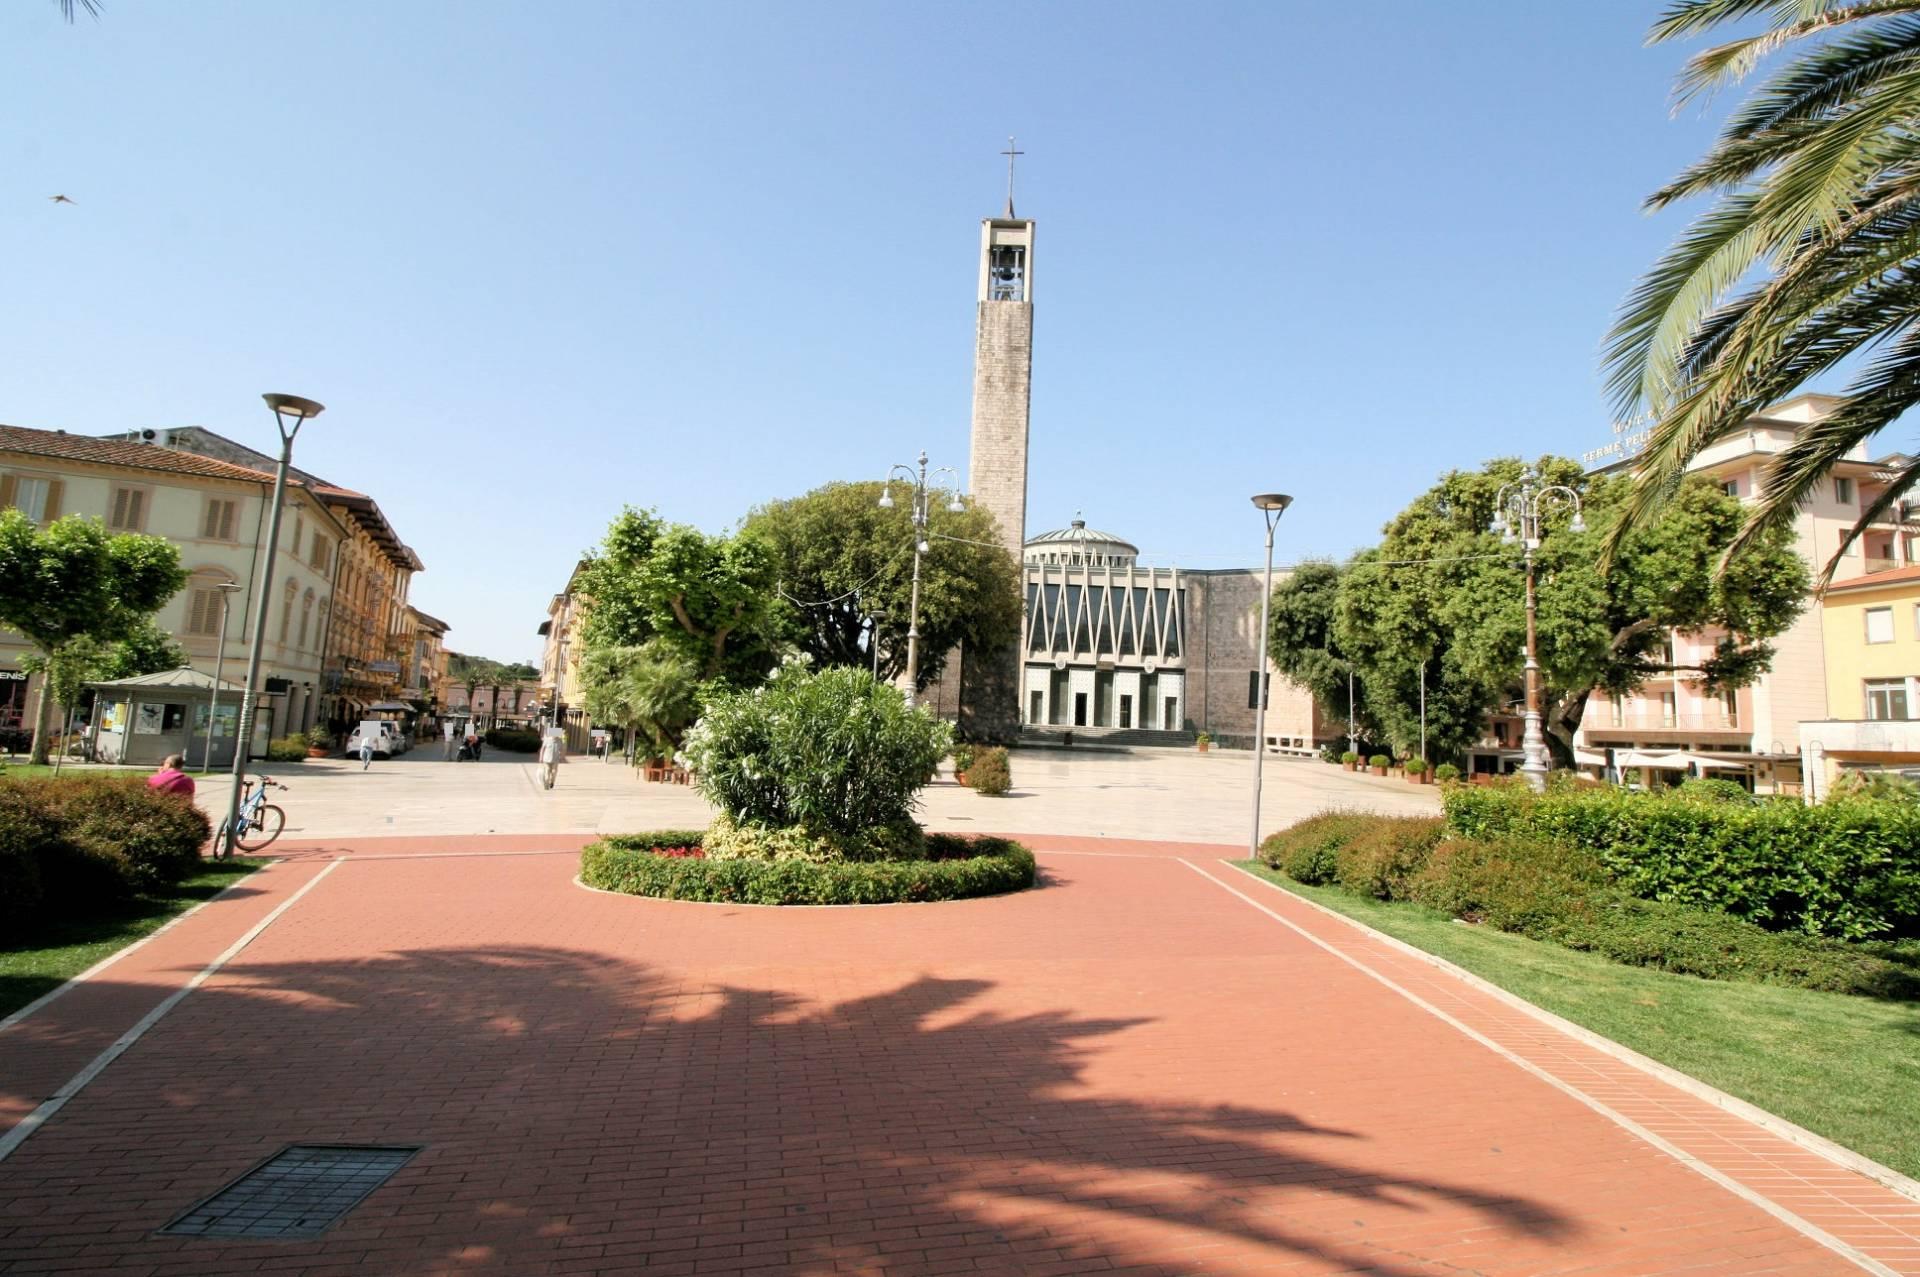 Albergo a Montecatini-Terme in Vendita